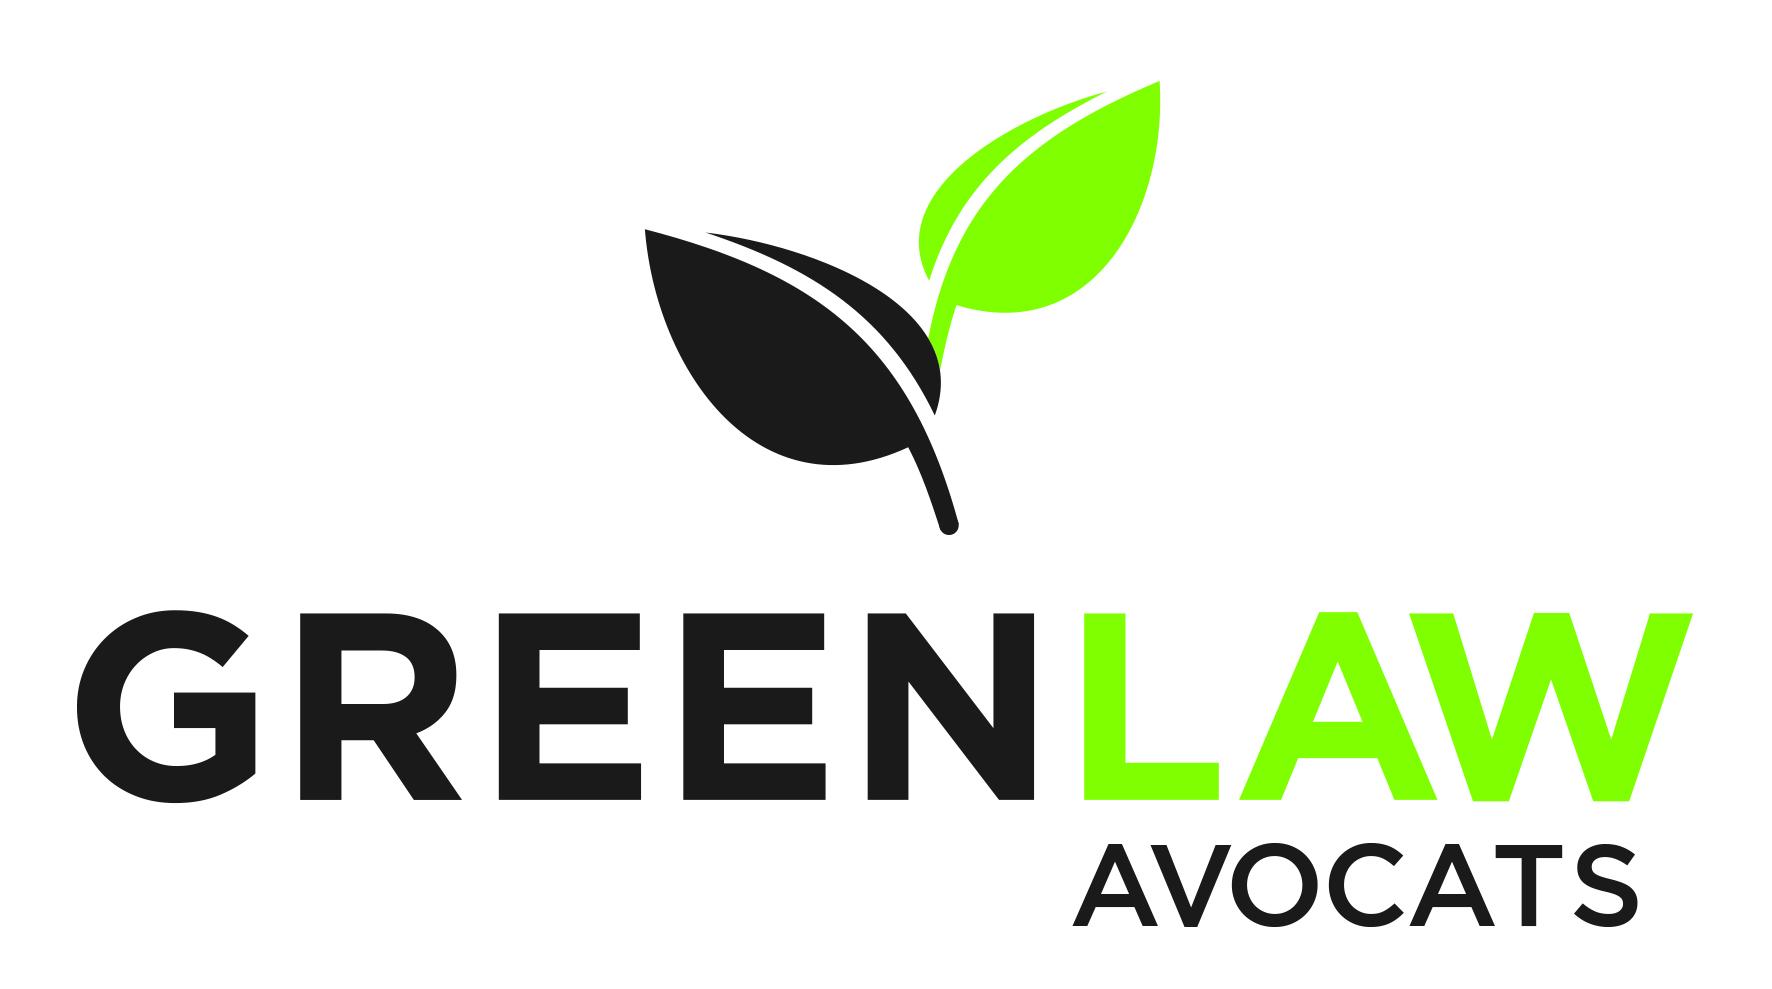 Green Law Avocats (Roubaix)